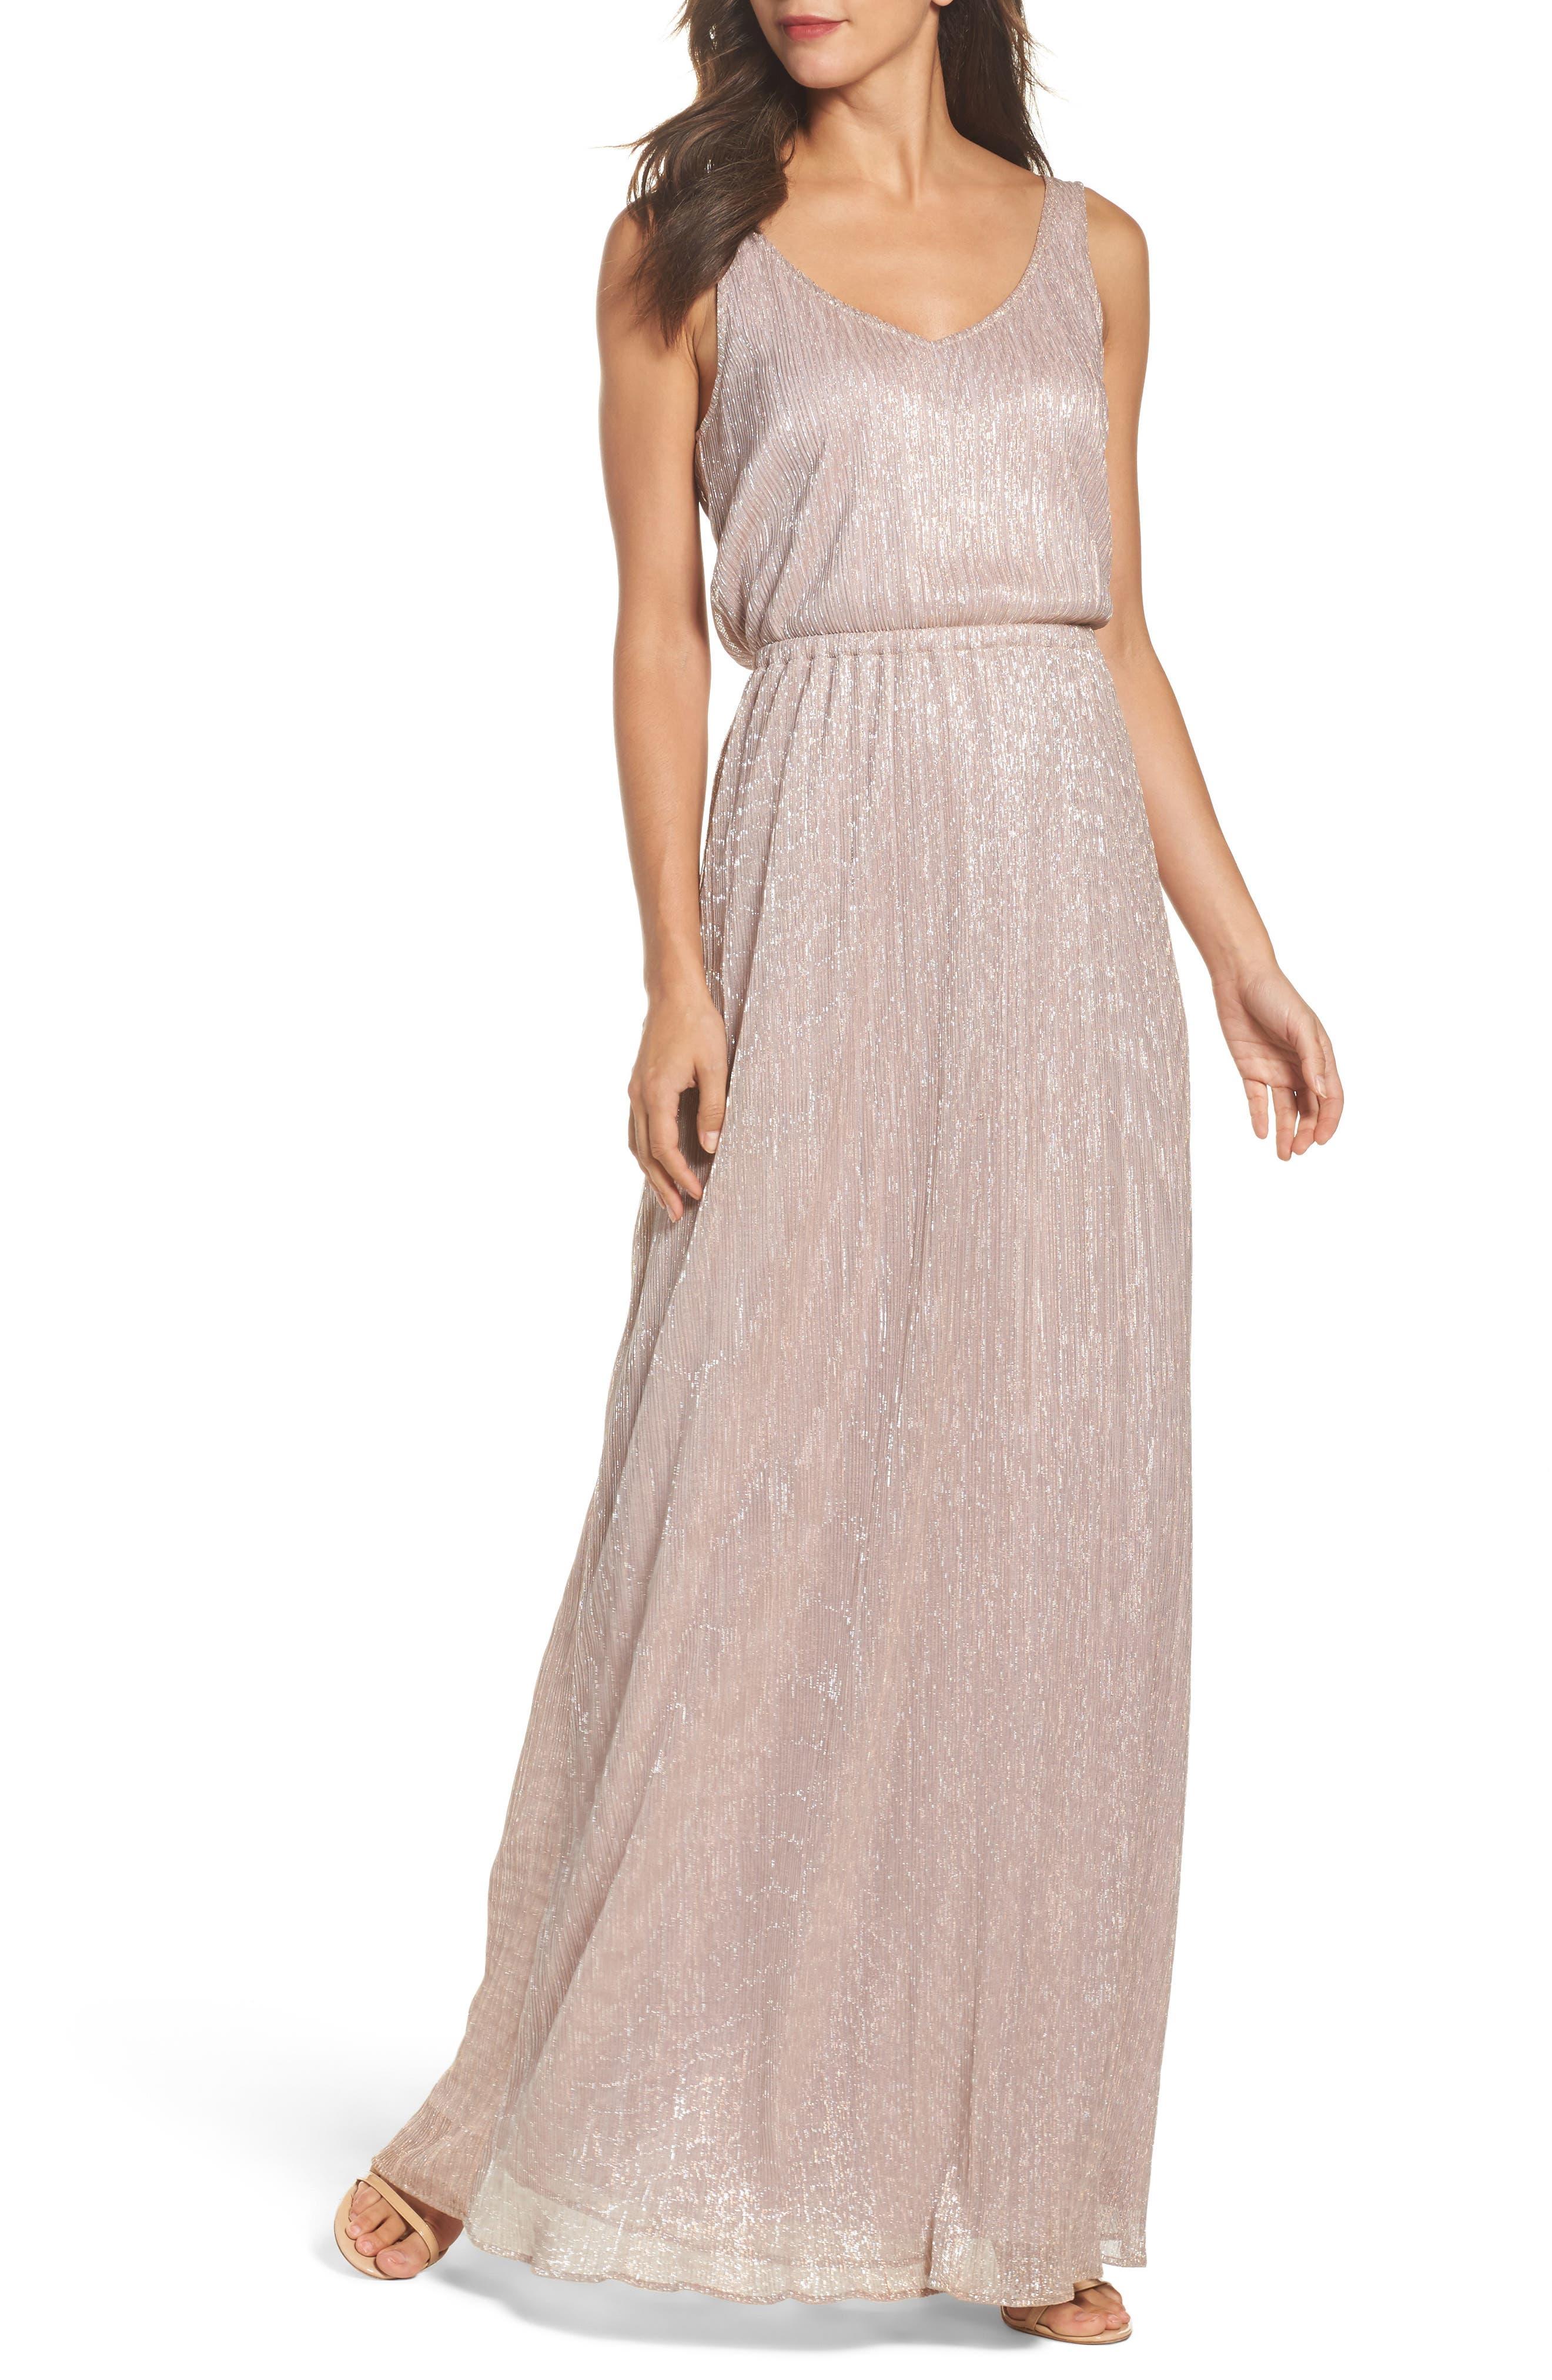 Kendall Blouson Maxi Dress,                         Main,                         color, Magic Muave Glitter